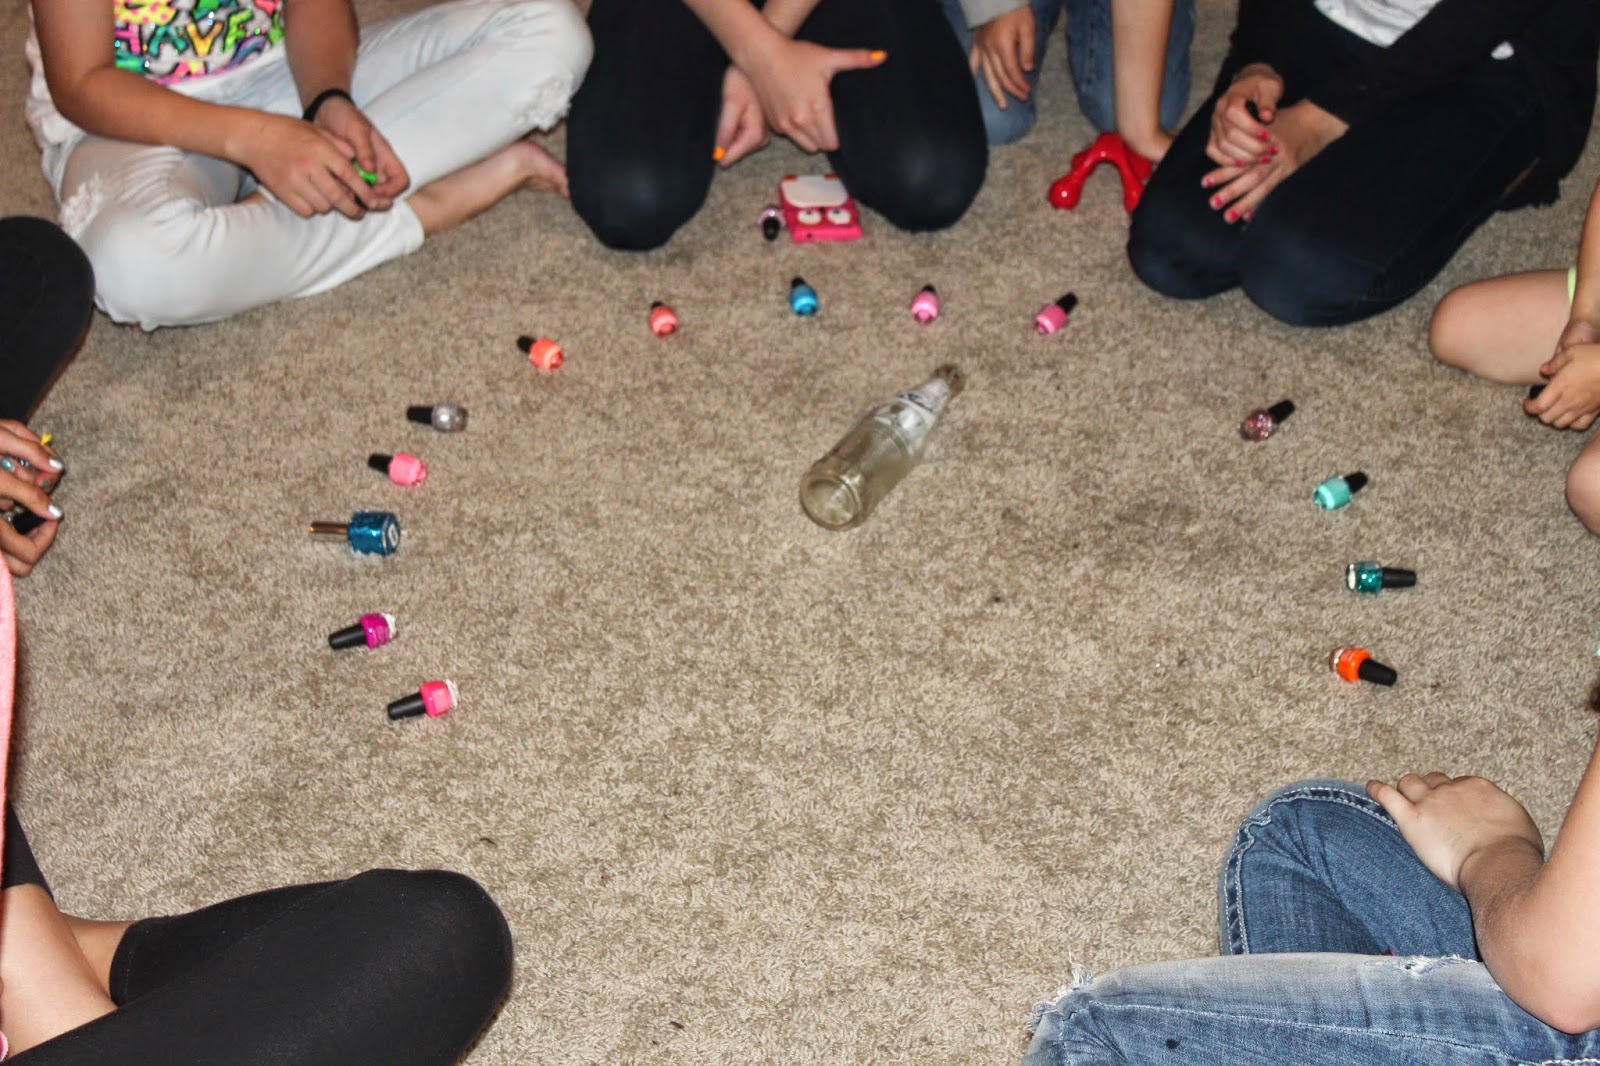 Create It Dabble Pre Teen Sleepover Games-5424